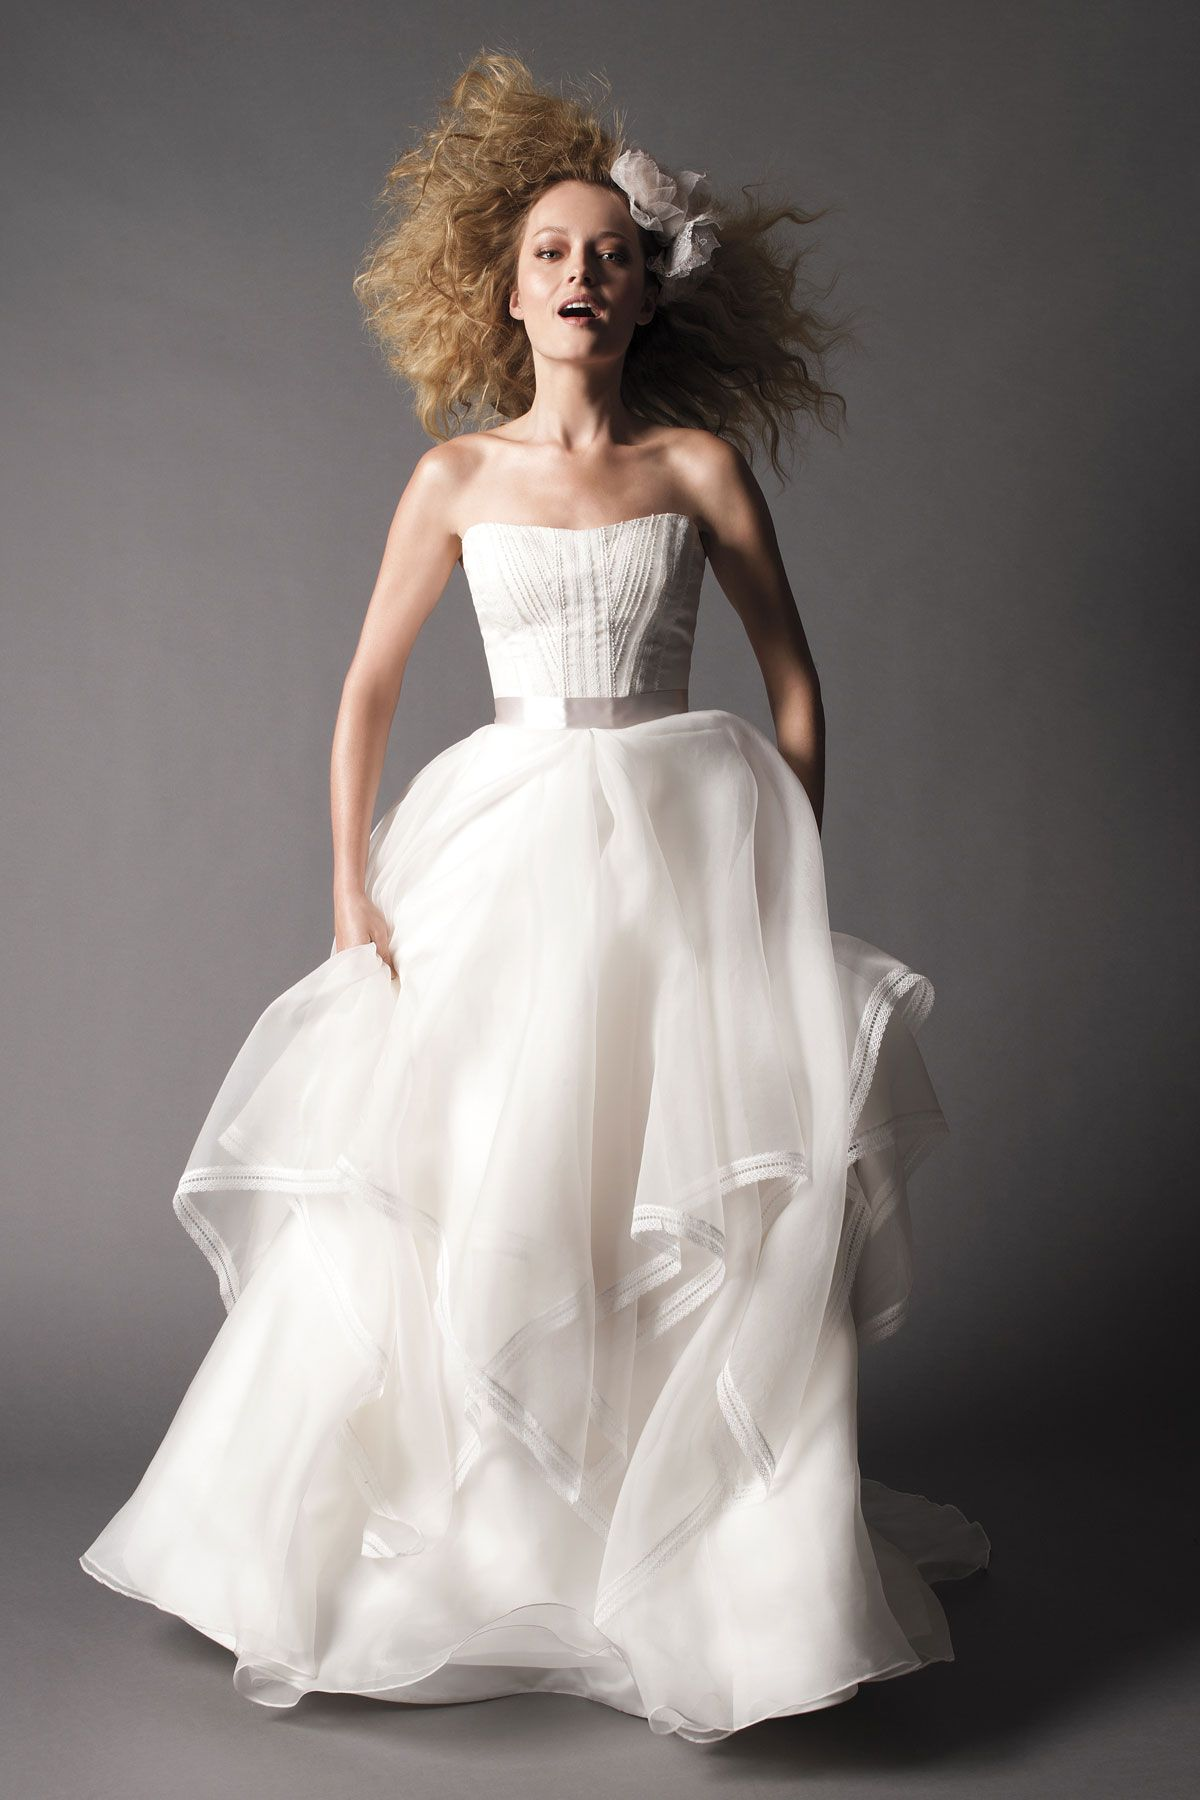 petite-wedding-dresses-for-guests.jpg (Изображение JPEG, 1200 × 1800 ...